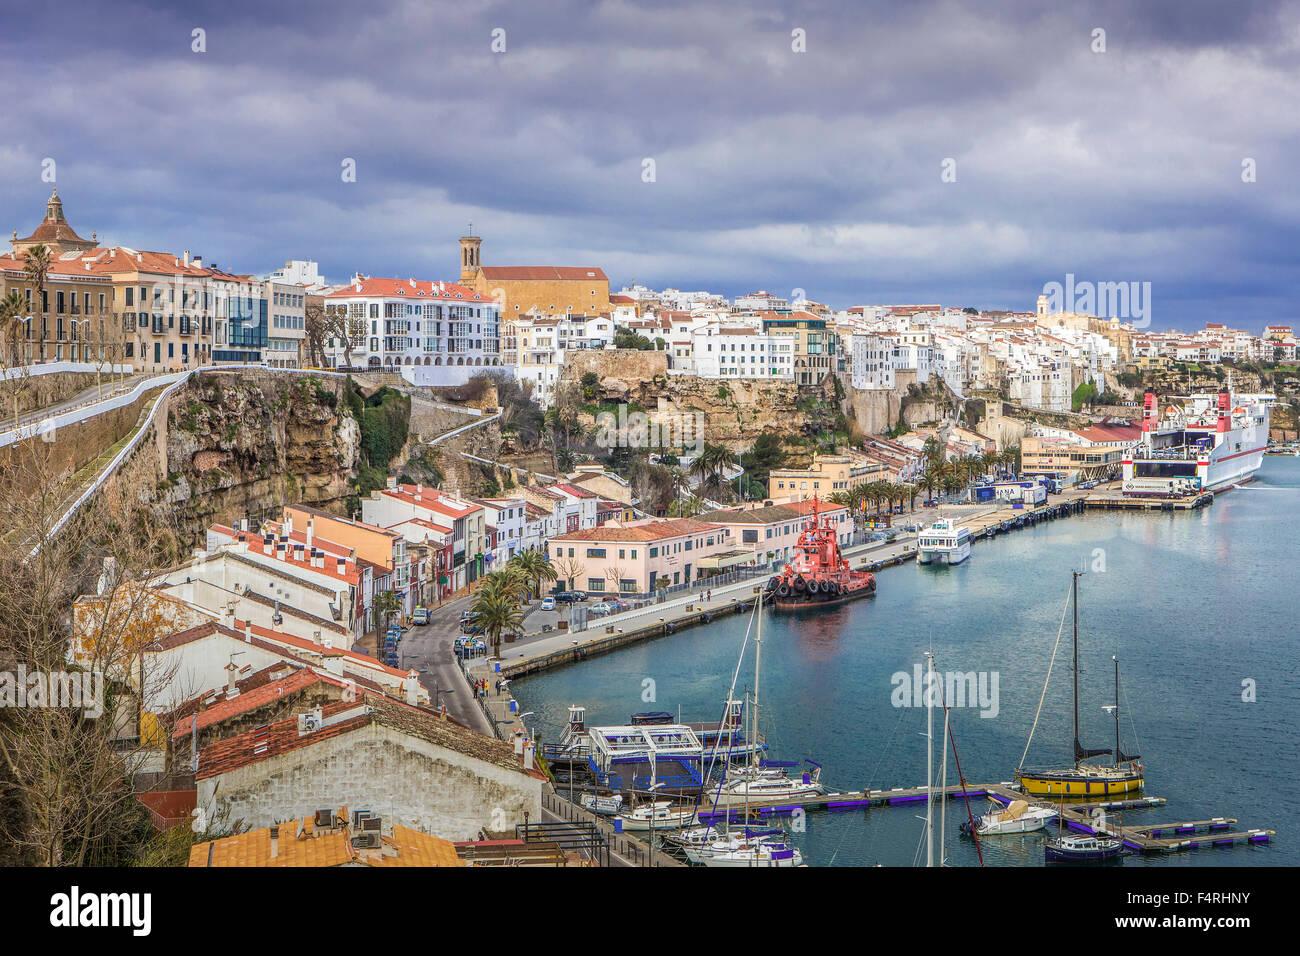 Balearic Islands, Landscape, Mao, town, Menorca, Island, Spain, Europe, Spring, architecture, cliff, Mediterranean, - Stock Image